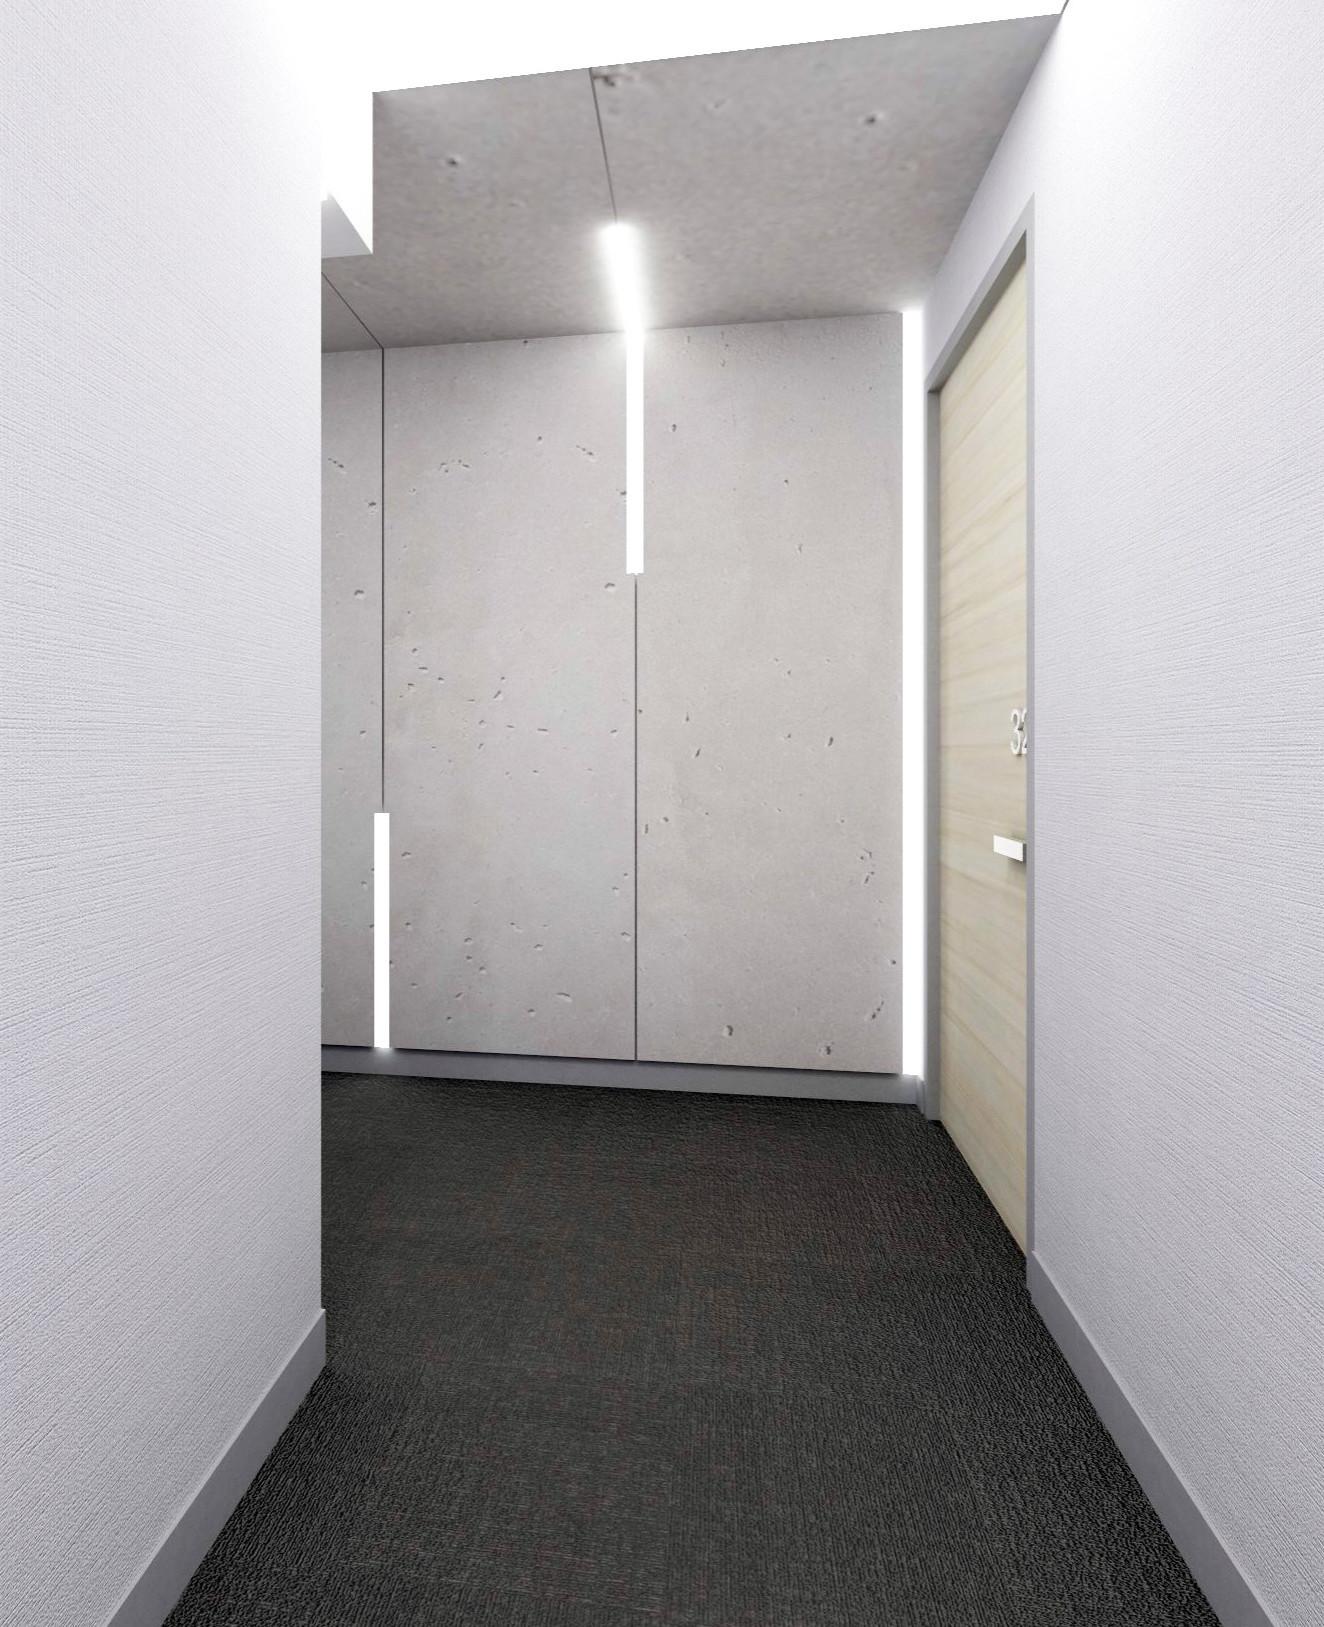 Residential Hallways Renovation